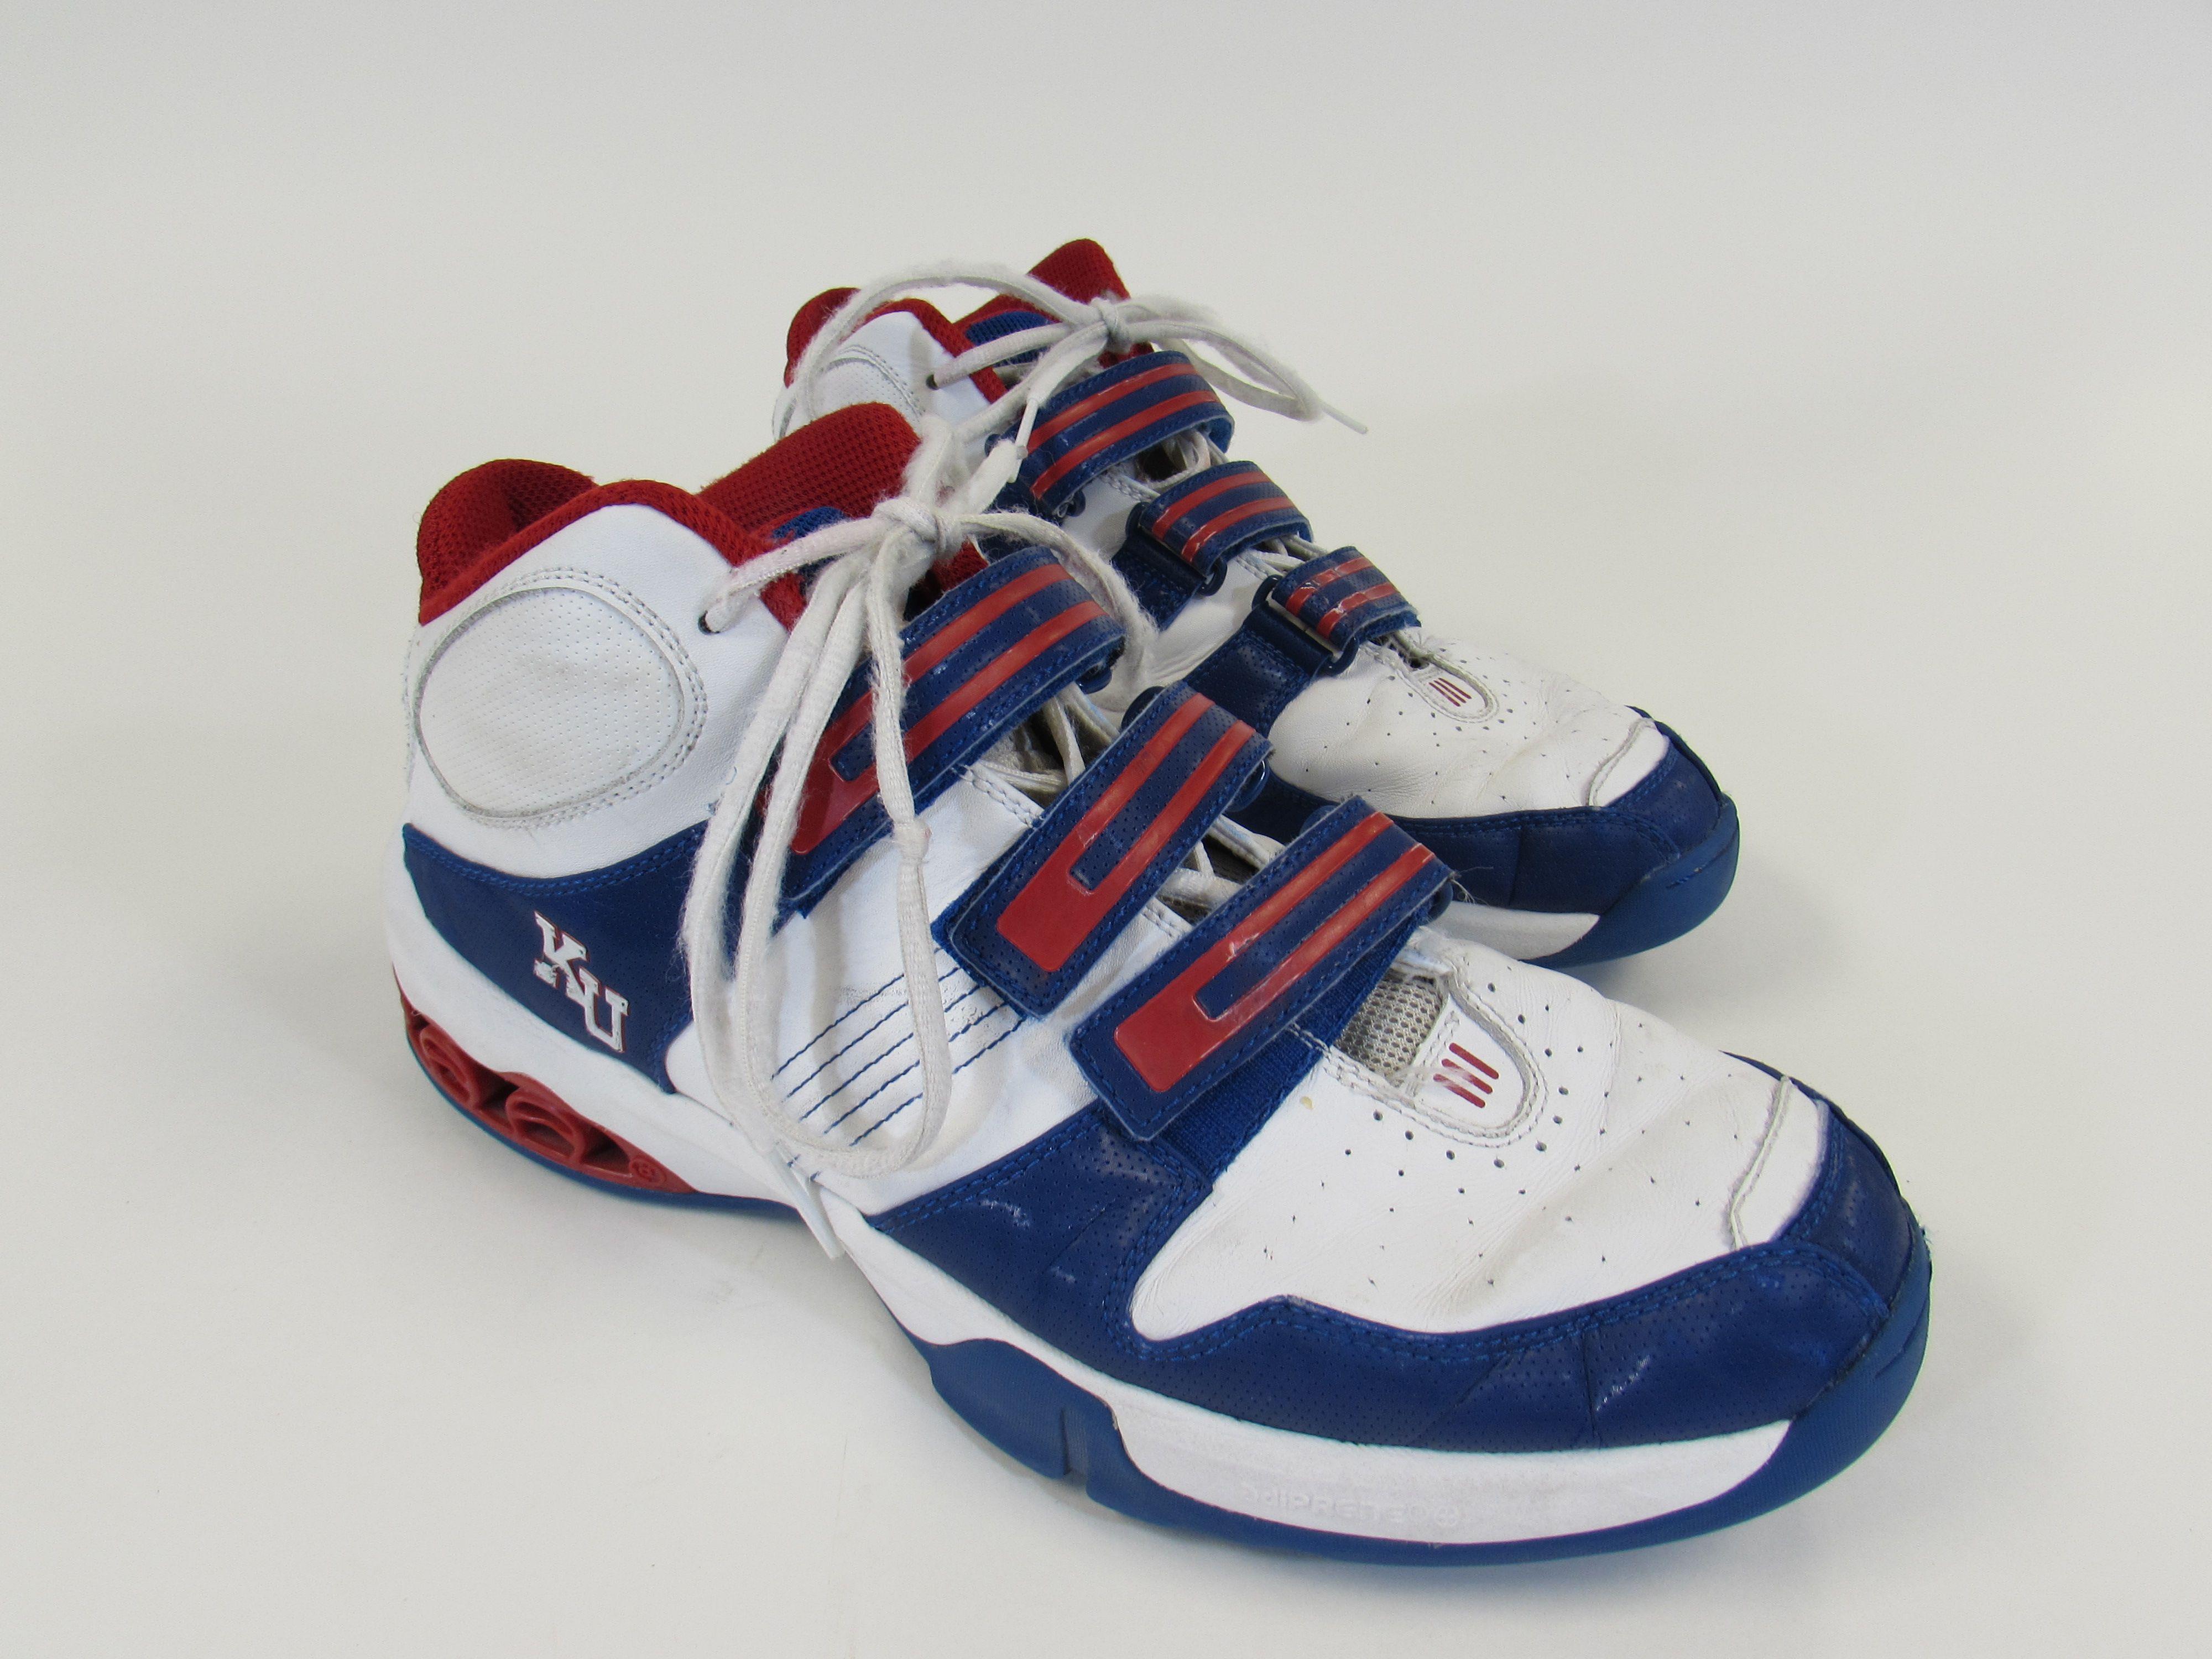 Ku Basketball Shoes Adidas